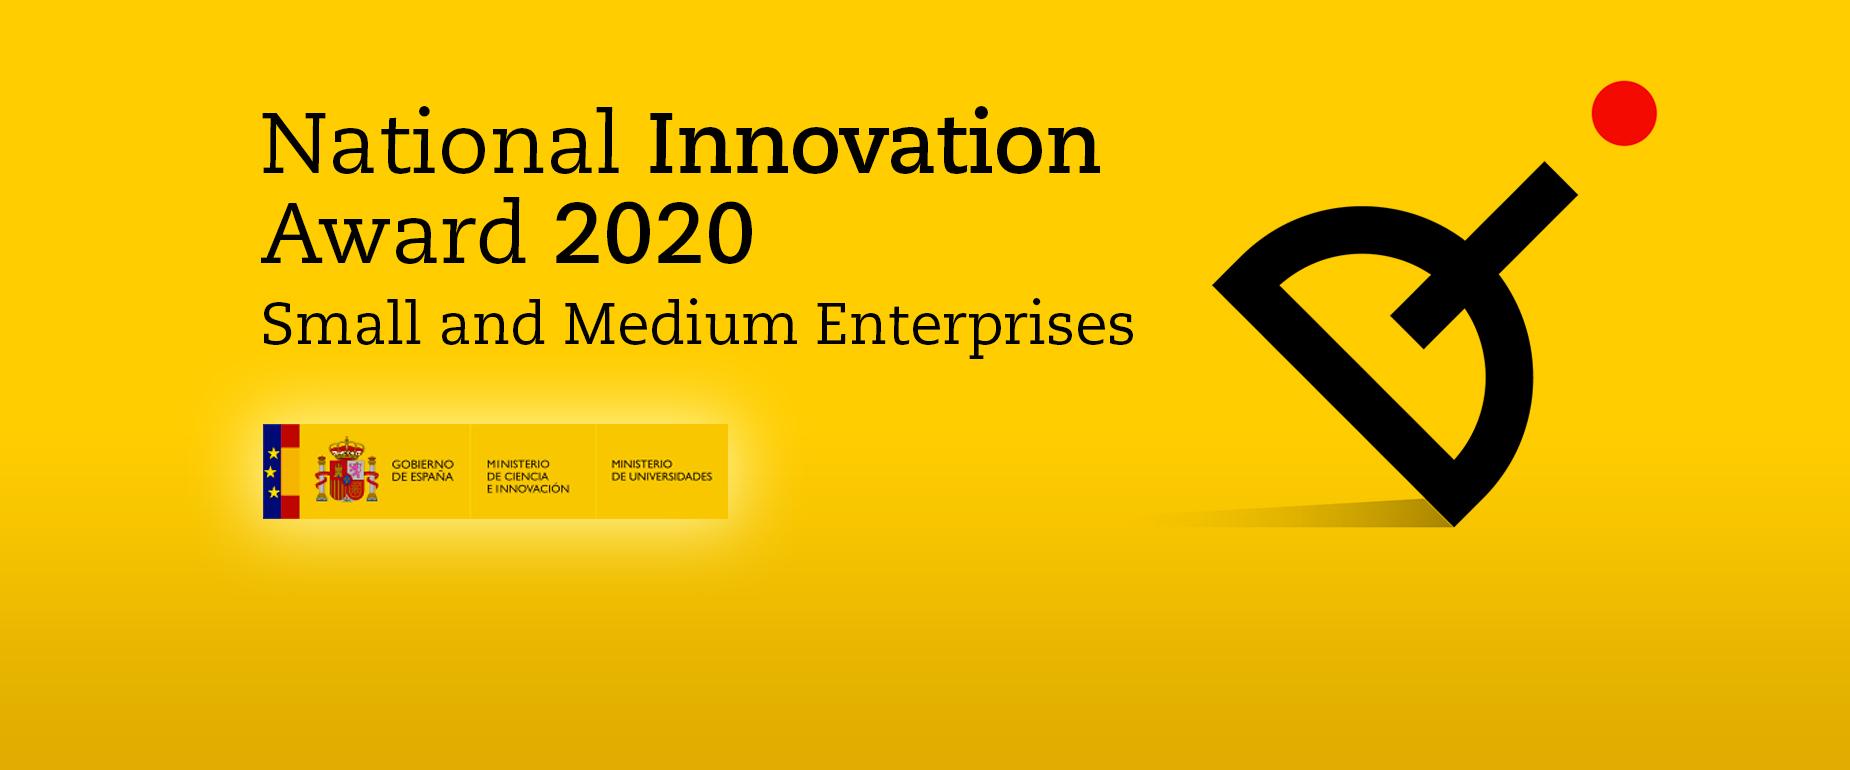 Seipasa receives the National Innovation Award 2020